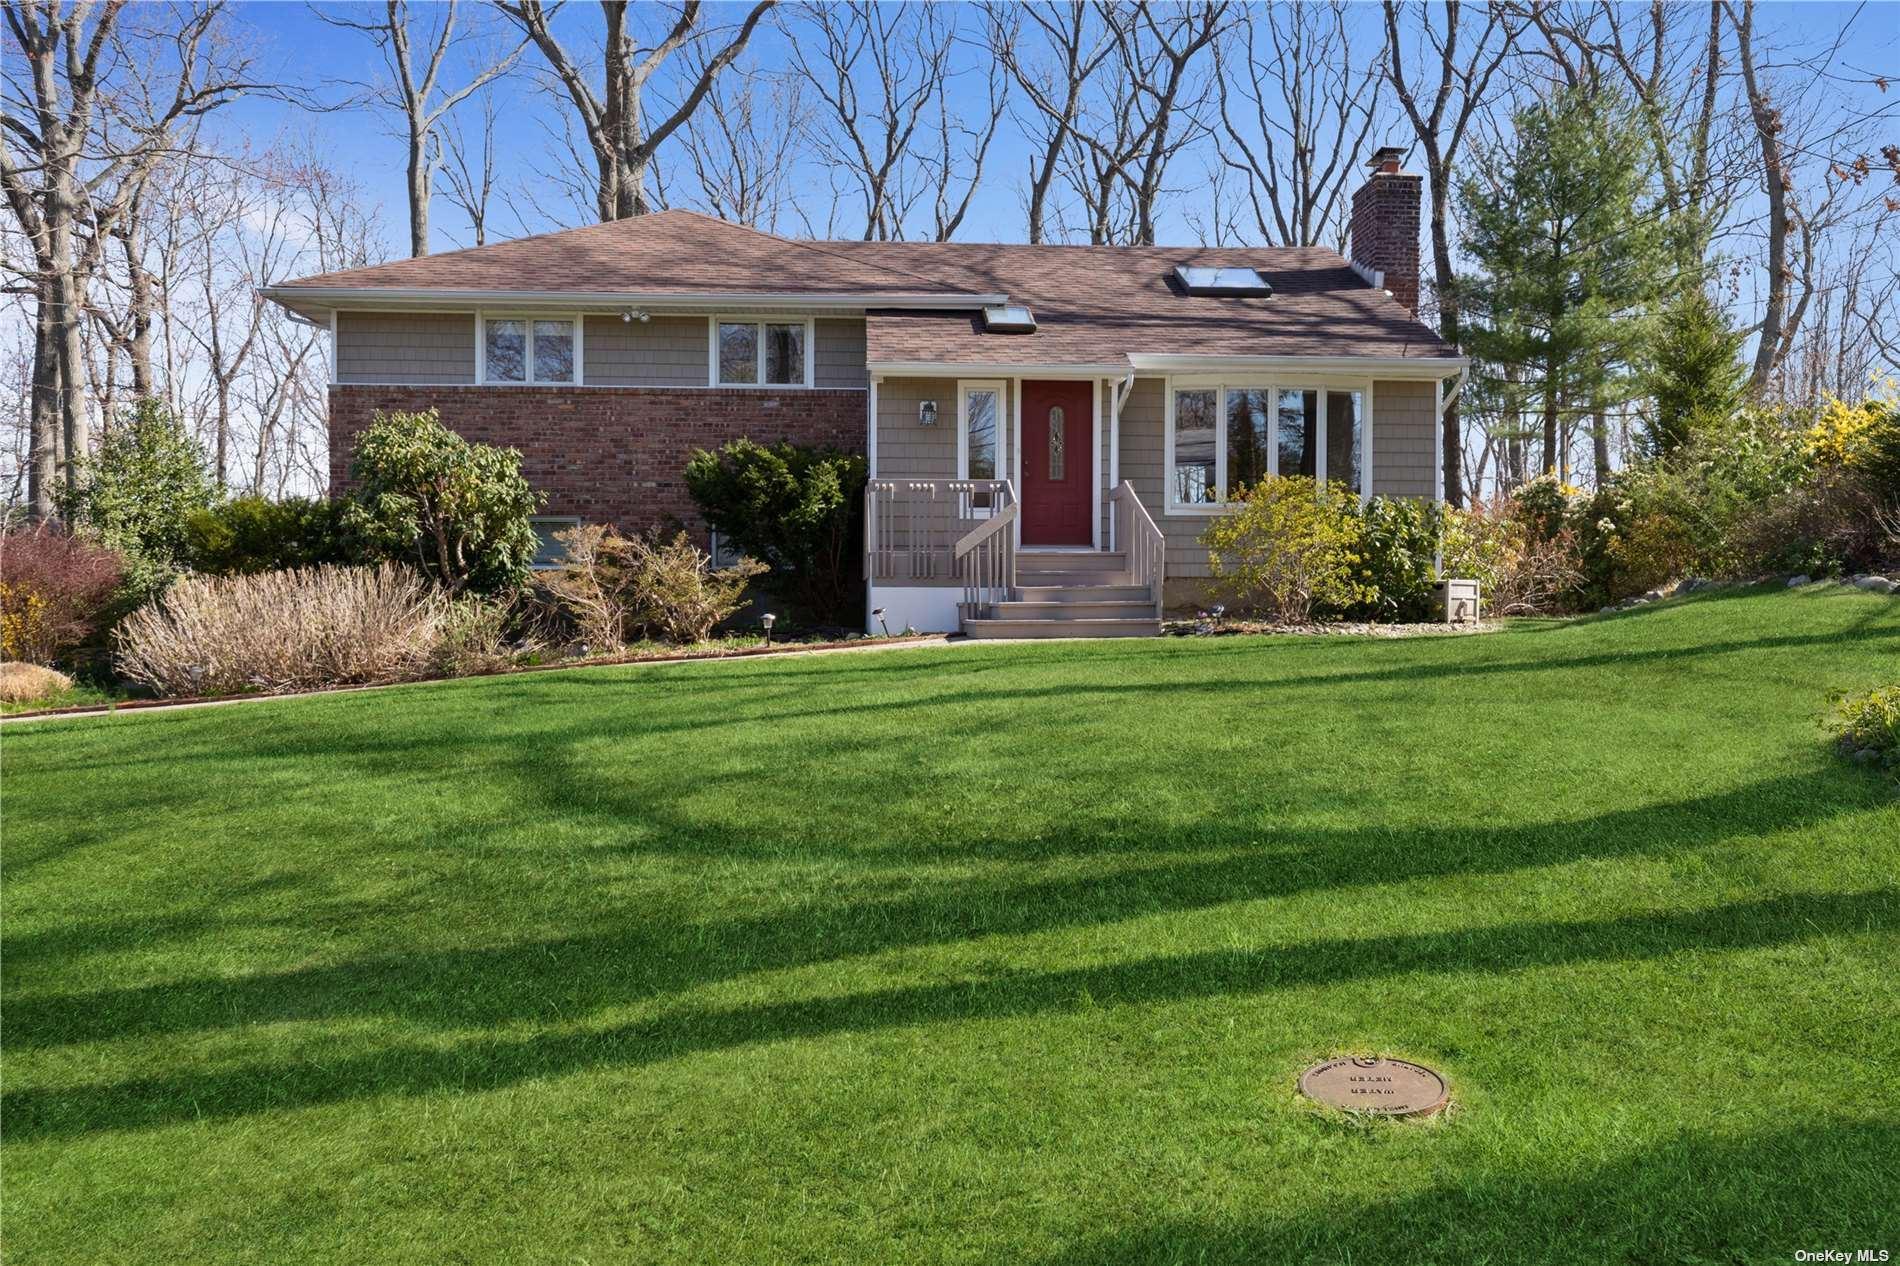 Photo of 15 Avon Court, Dix Hills, NY 11746 (MLS # 3302756)